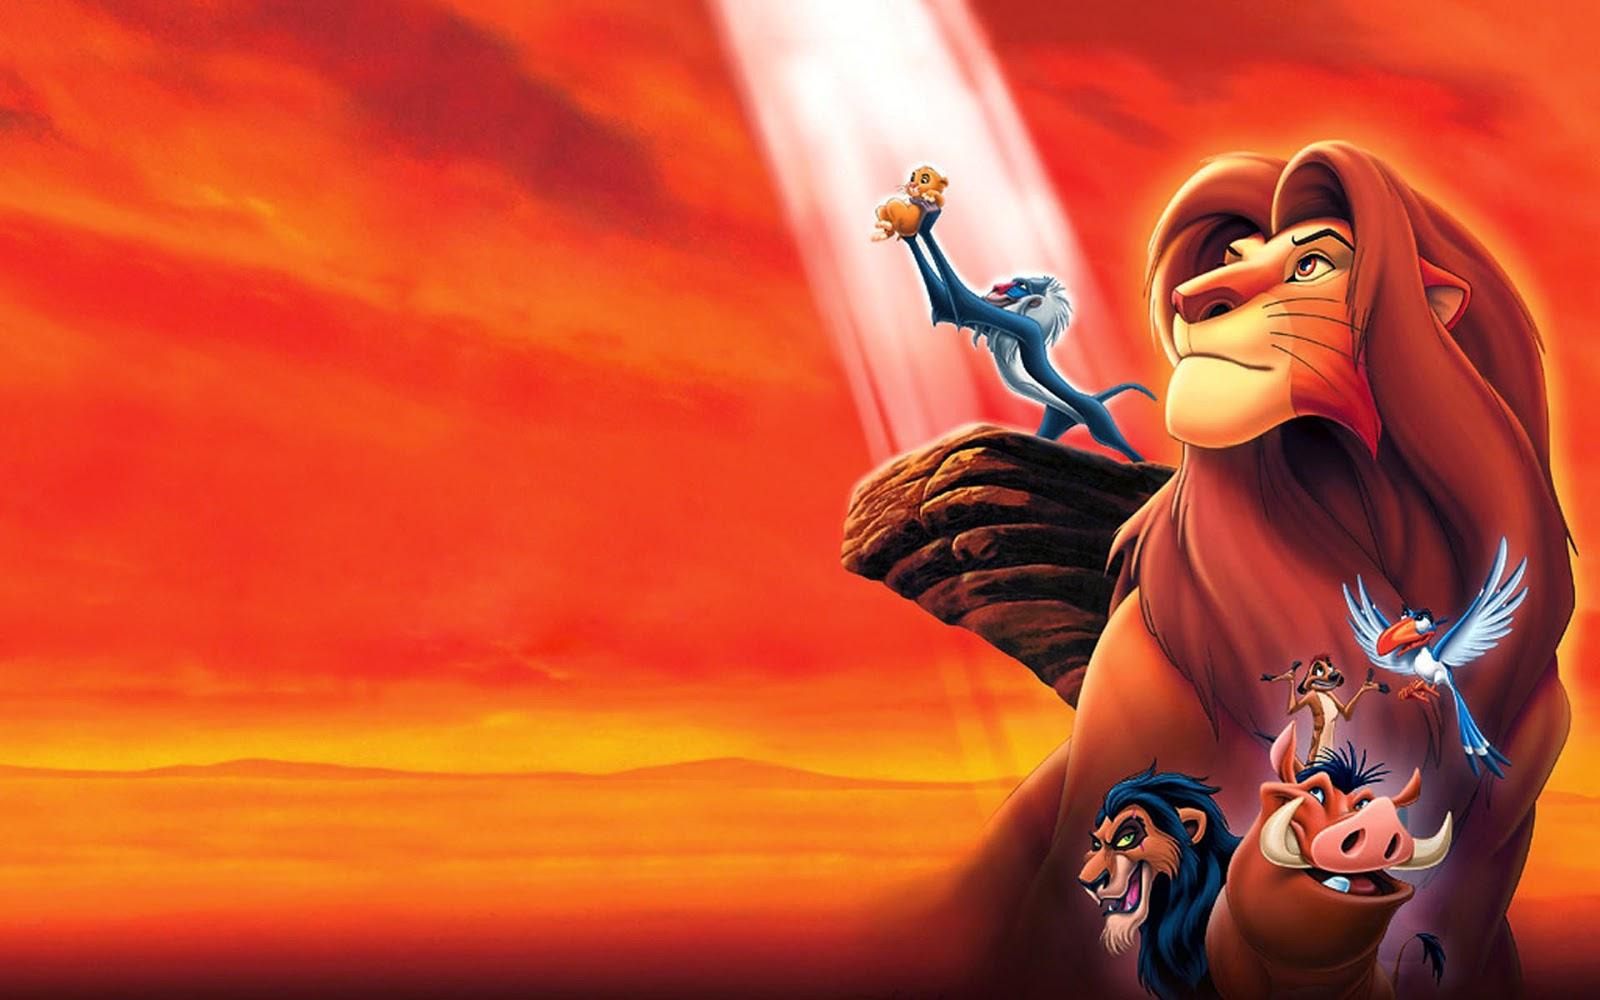 Hd Lion King Wallpaper: Cartoon Network Walt Disney Pictures: The Lion King HD